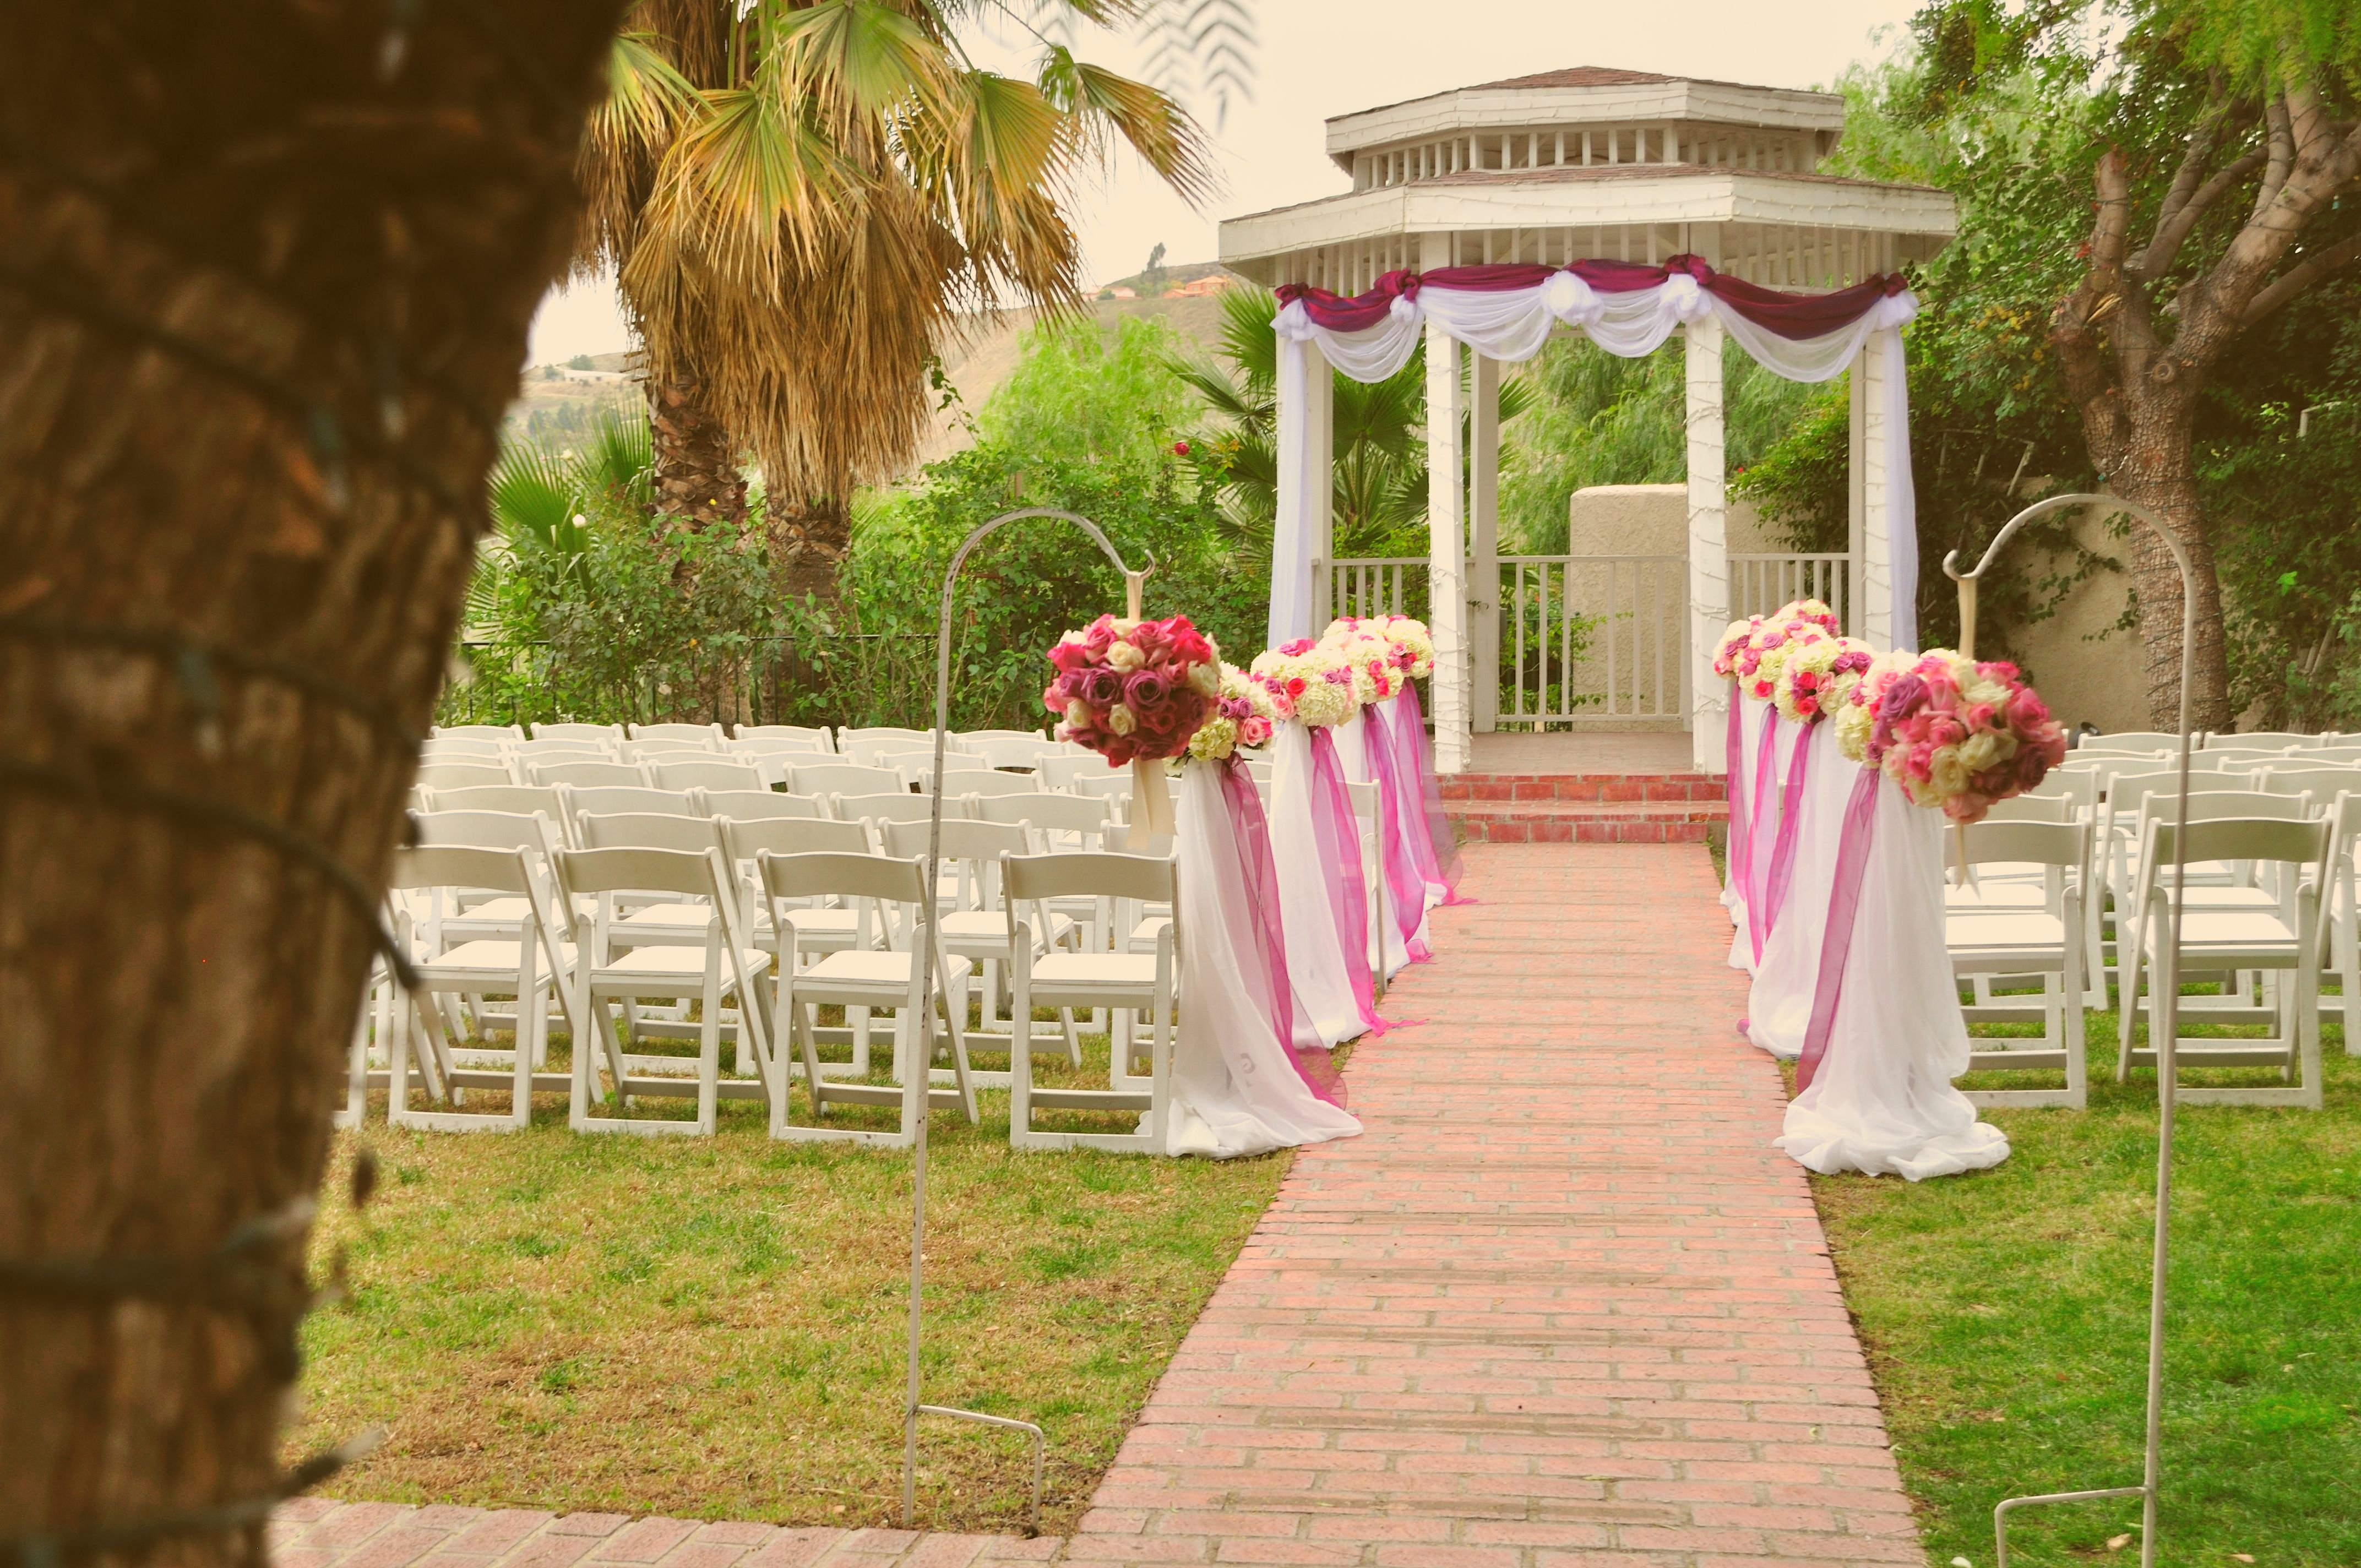 Outdoor Wedding Gazebo Decorating Ideas : Gazebo wedding flower decor amanda s